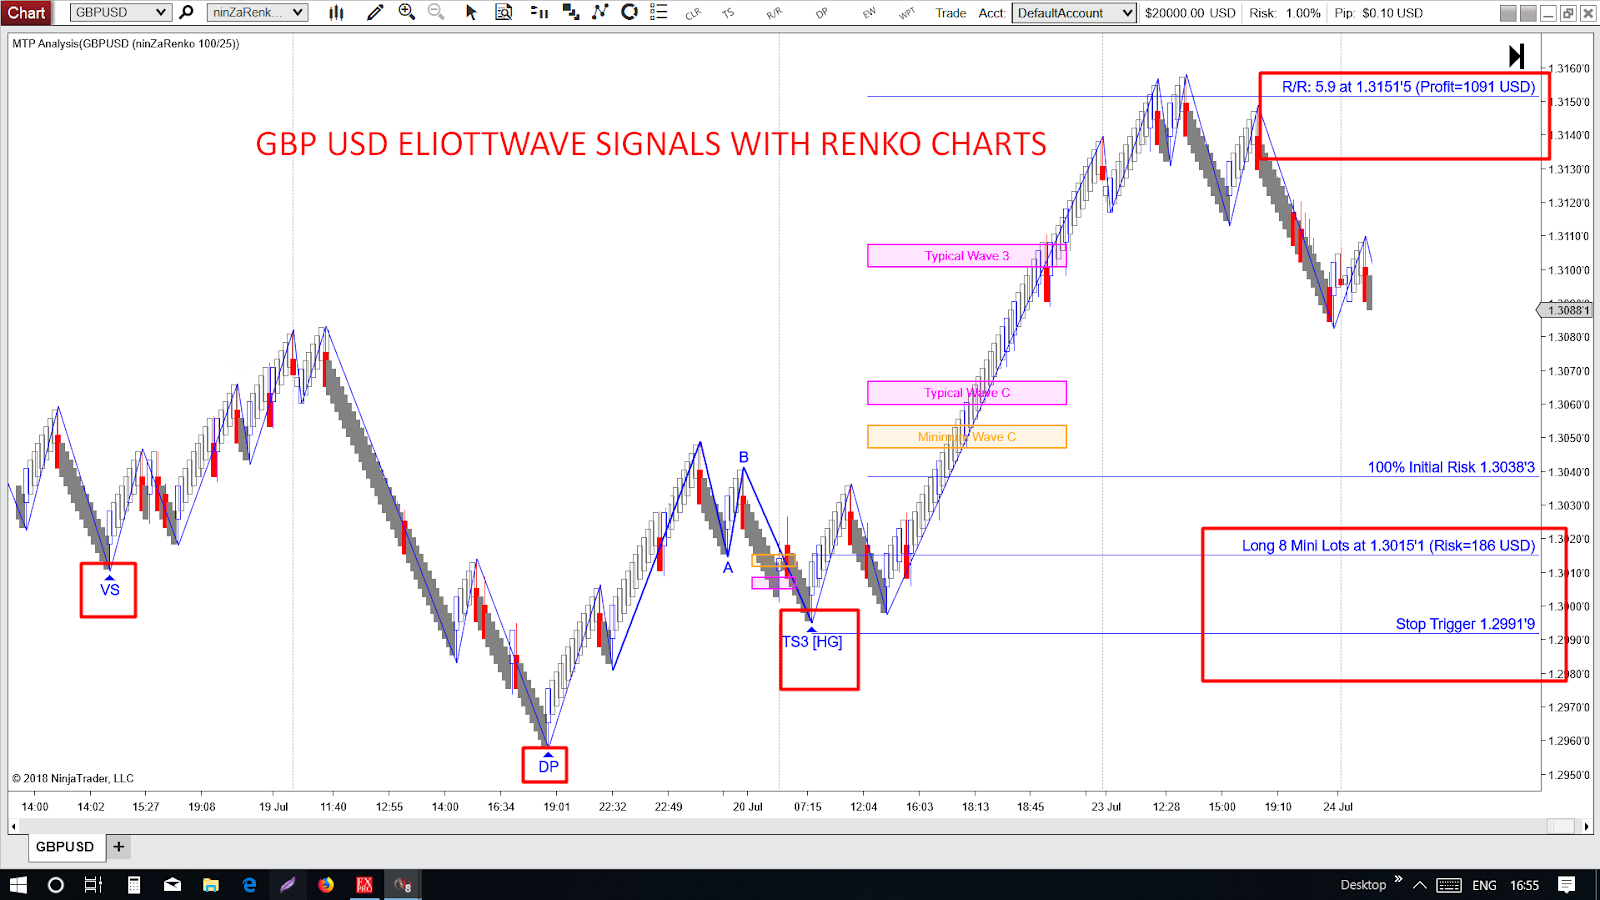 RENKO CHART SUPERIORS: Renko Charts With Elliott Wave